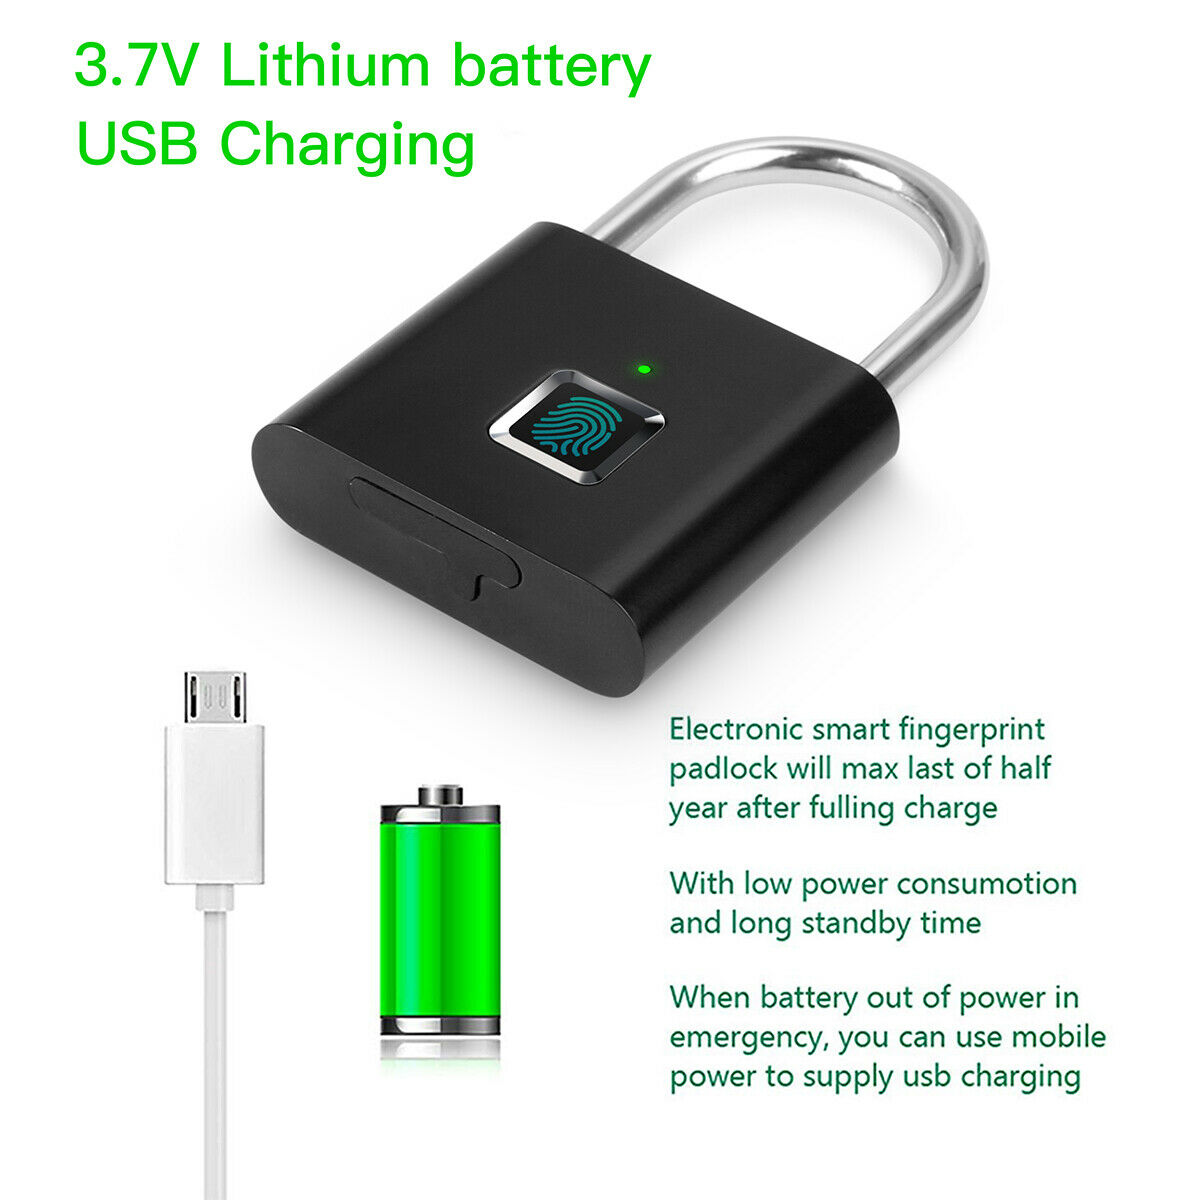 SMART FINGERPRINT ANTI-THEFT KEYLESS SECURITY W/USB CABLE